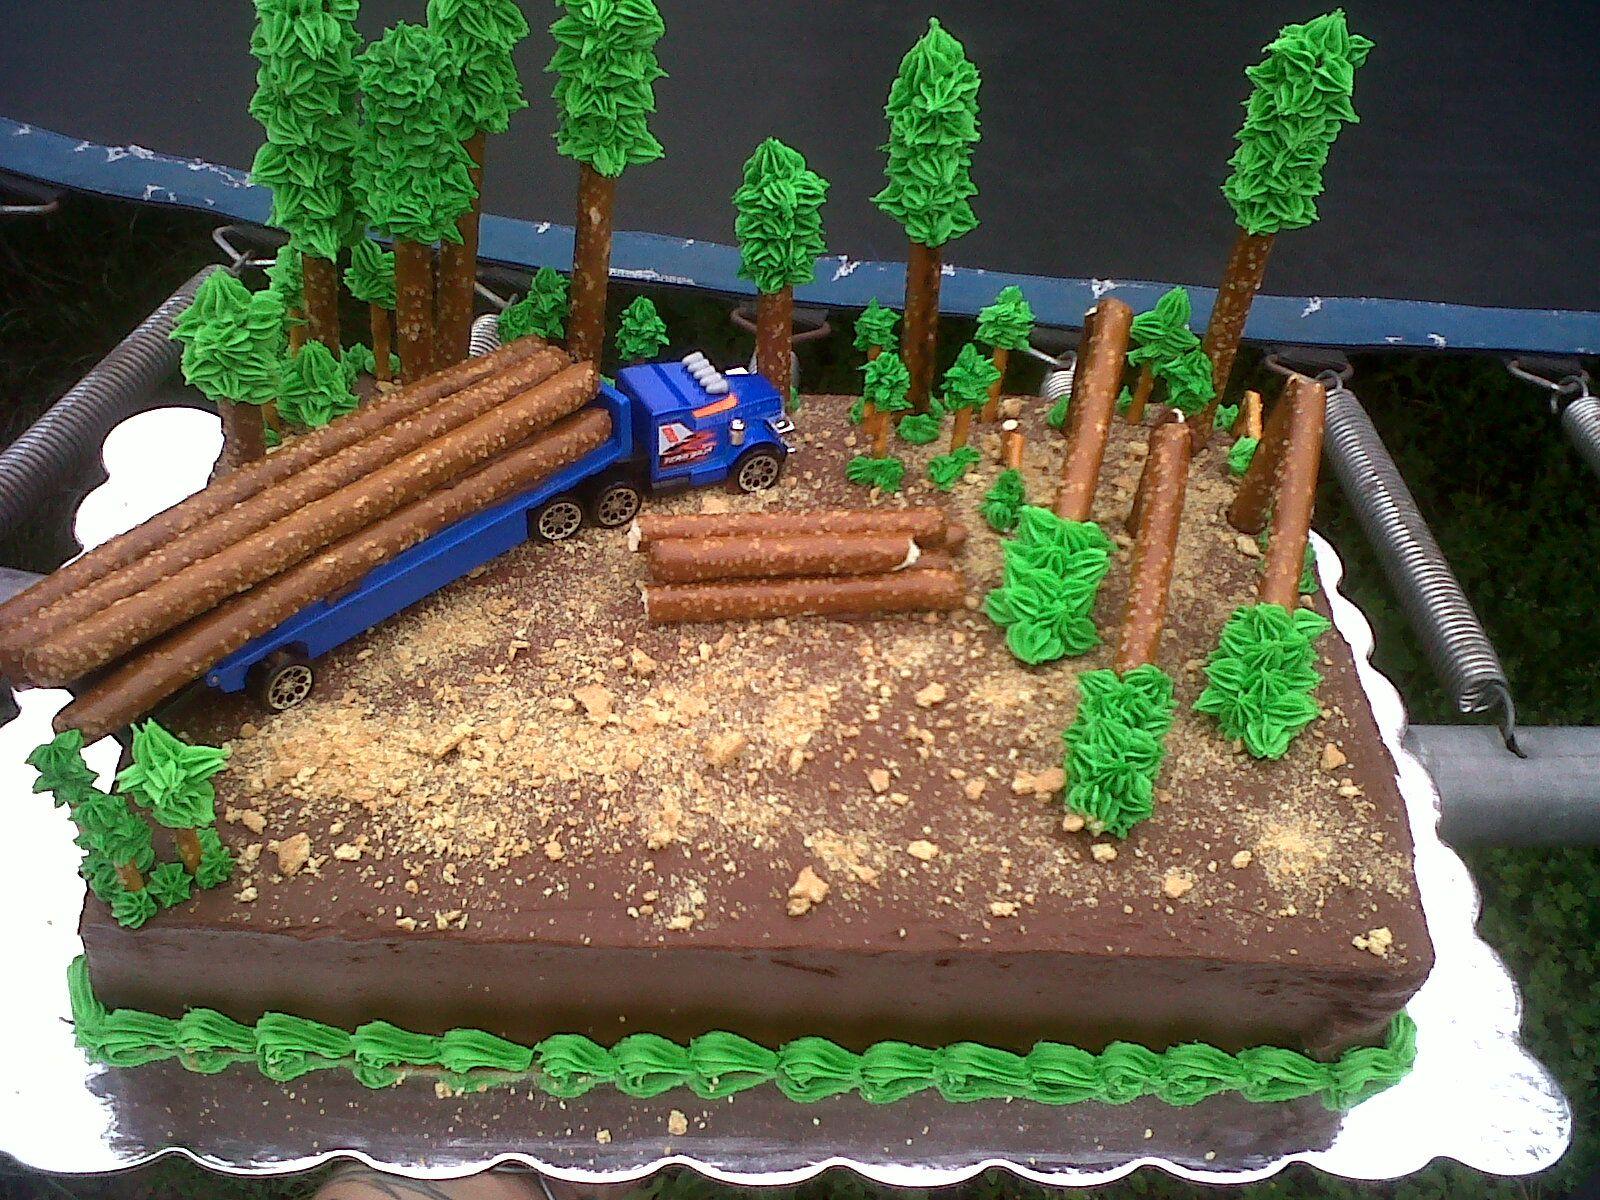 Log Hauling Truck Driving Cake With Pretzel Trees Stuff